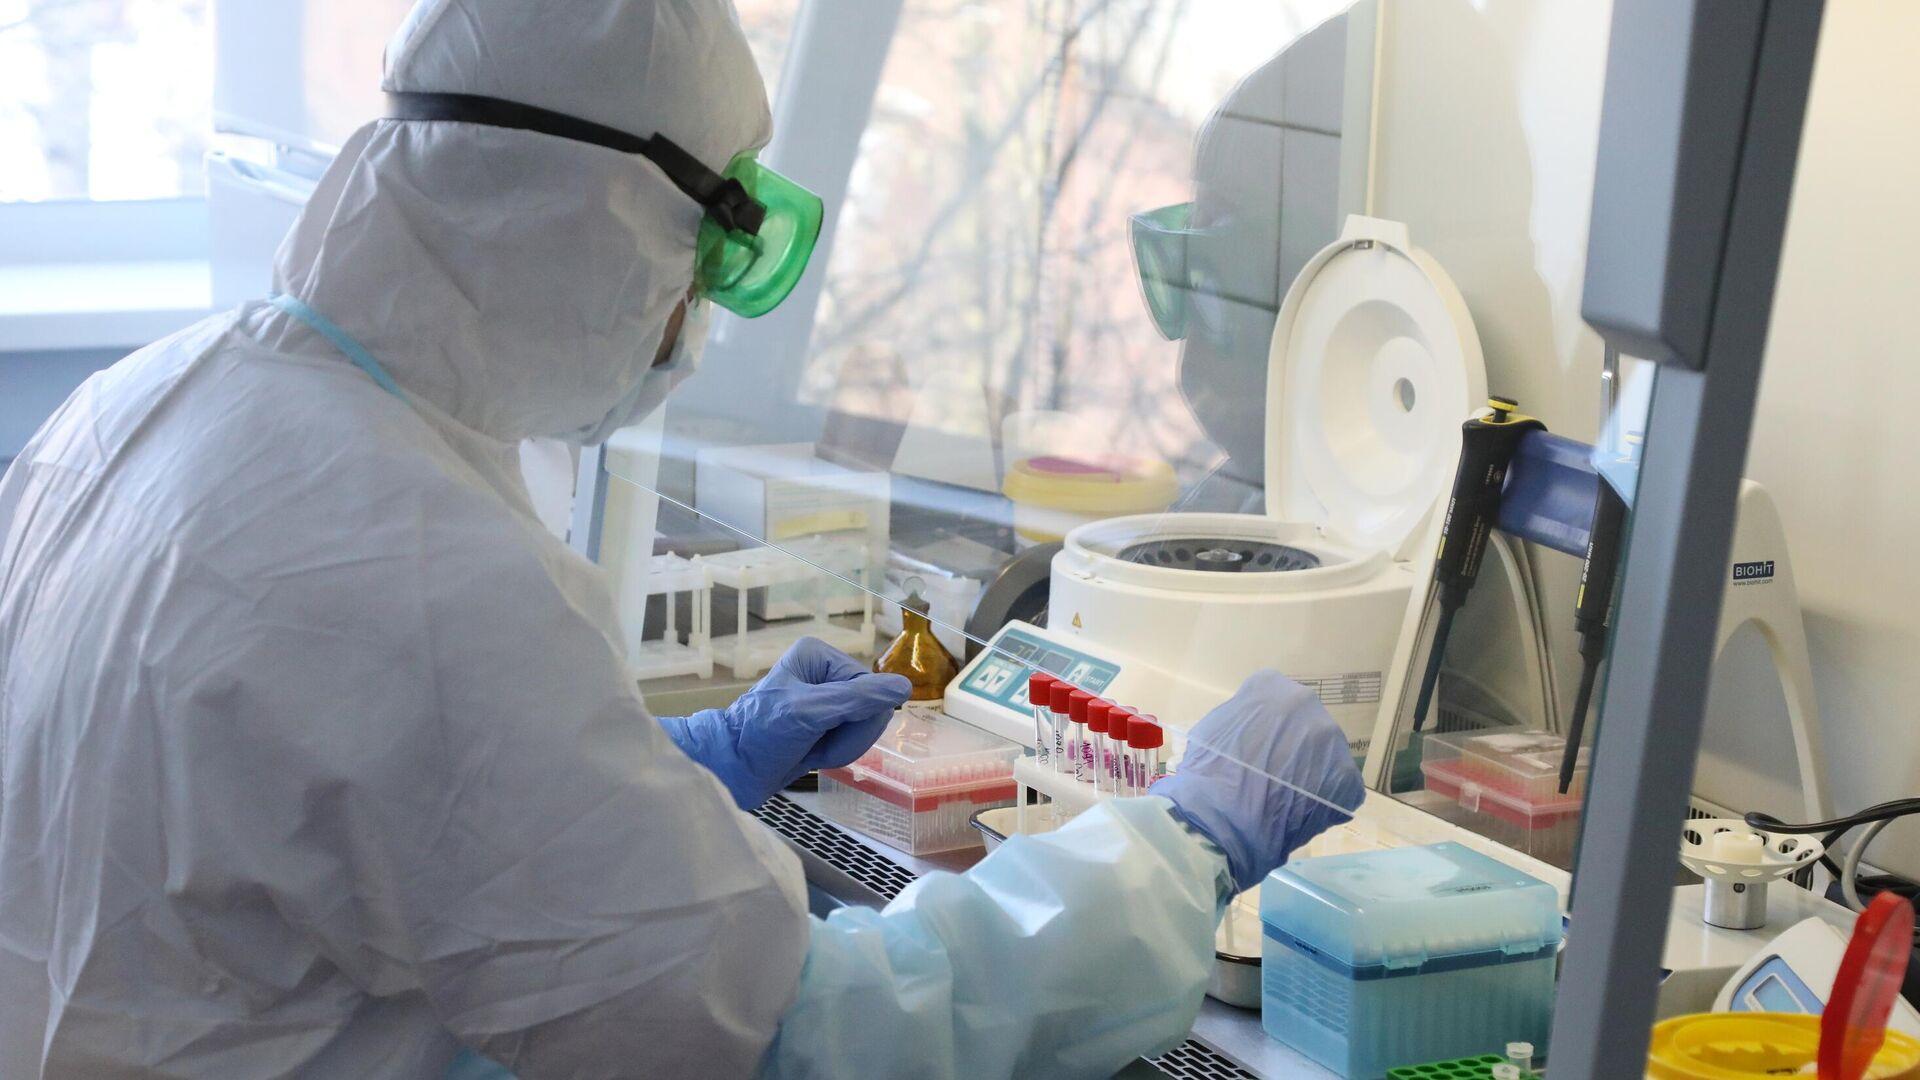 Лаборатория для тестирования на коронавирус  - РИА Новости, 1920, 03.03.2021